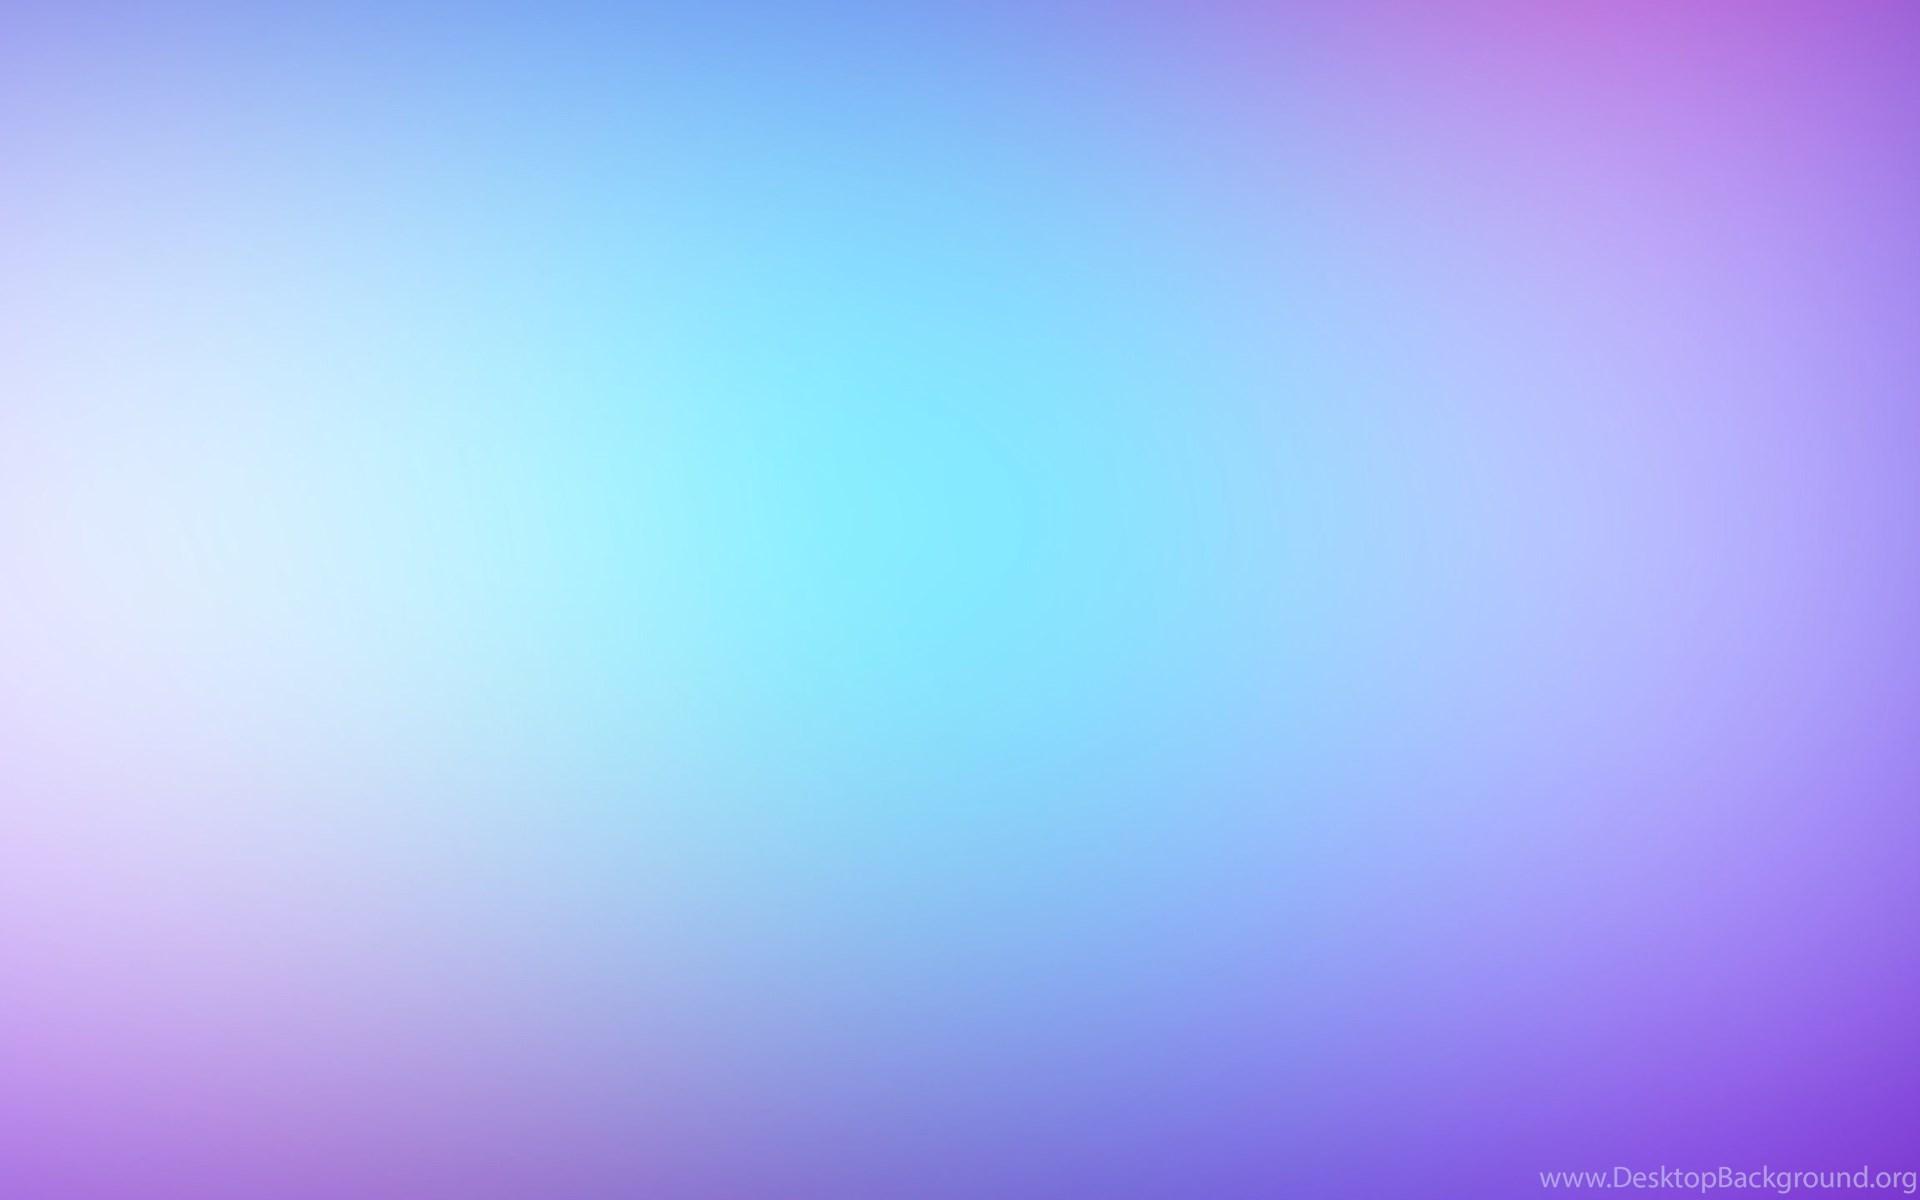 Simple Color Hd 1080p Wallpaper Color Hd Wallpaper Hd 1080p Hd Desktop Background